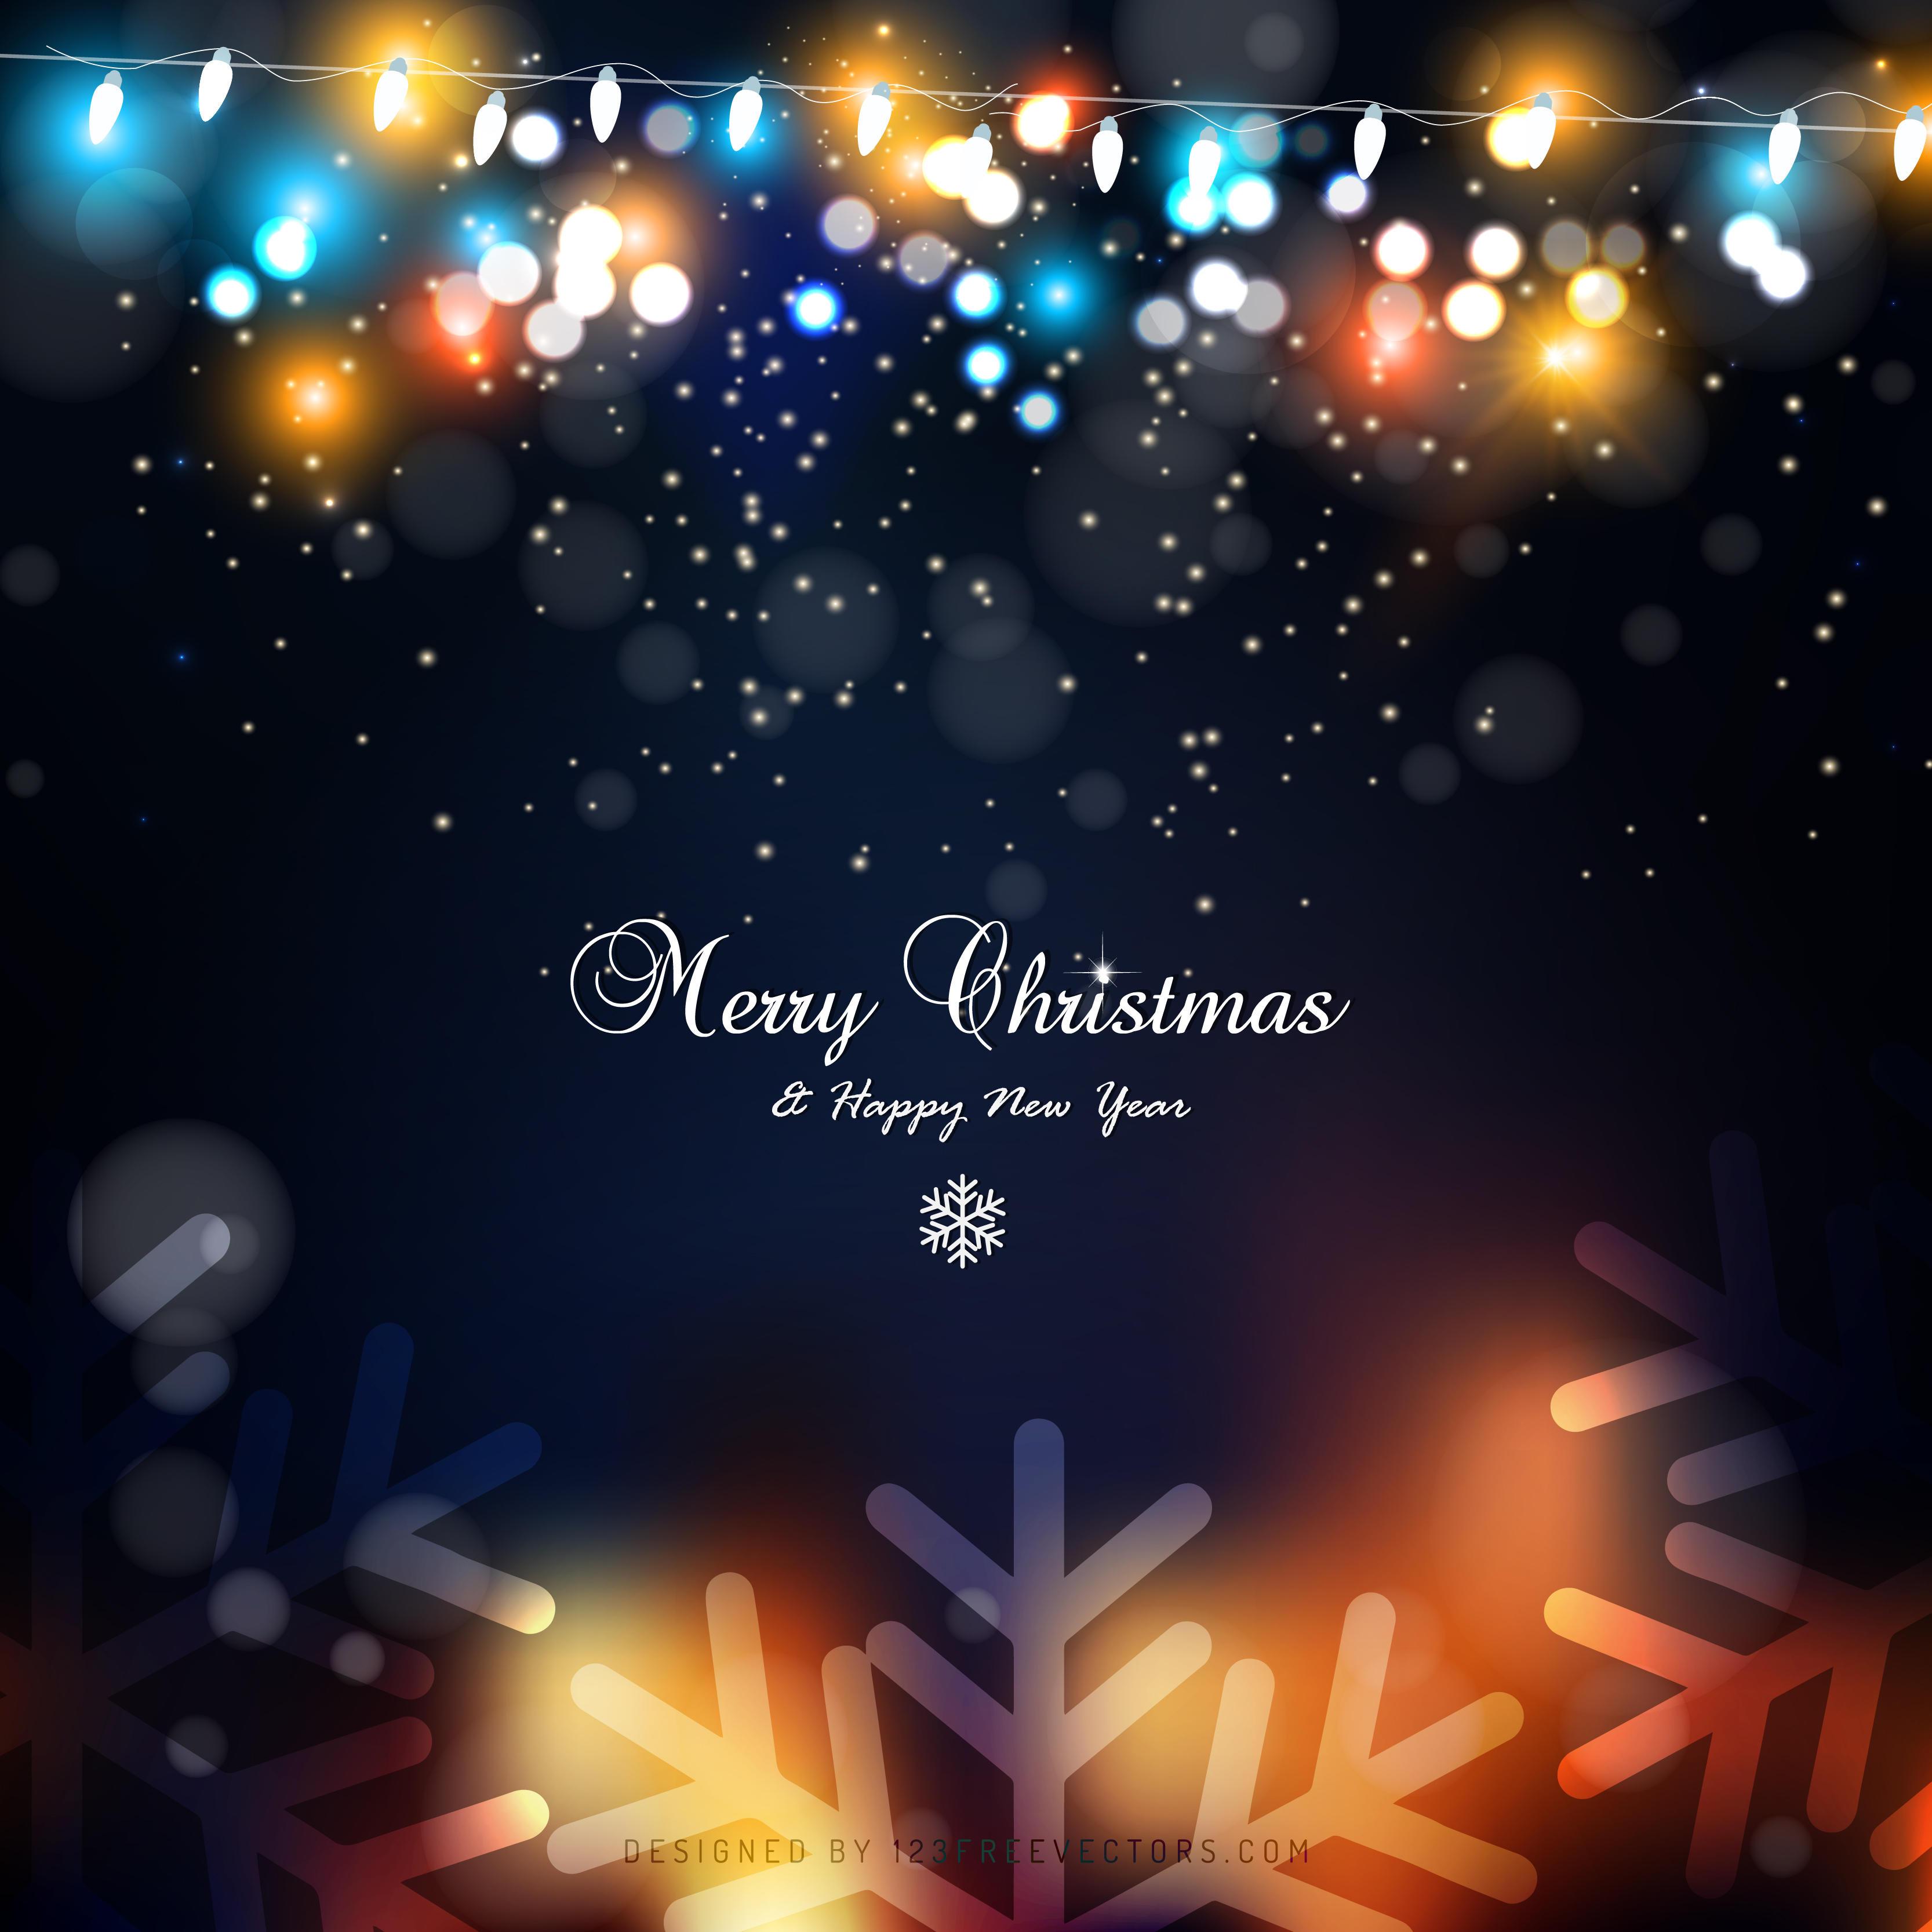 blue orange christmas lights background image 123freevectors